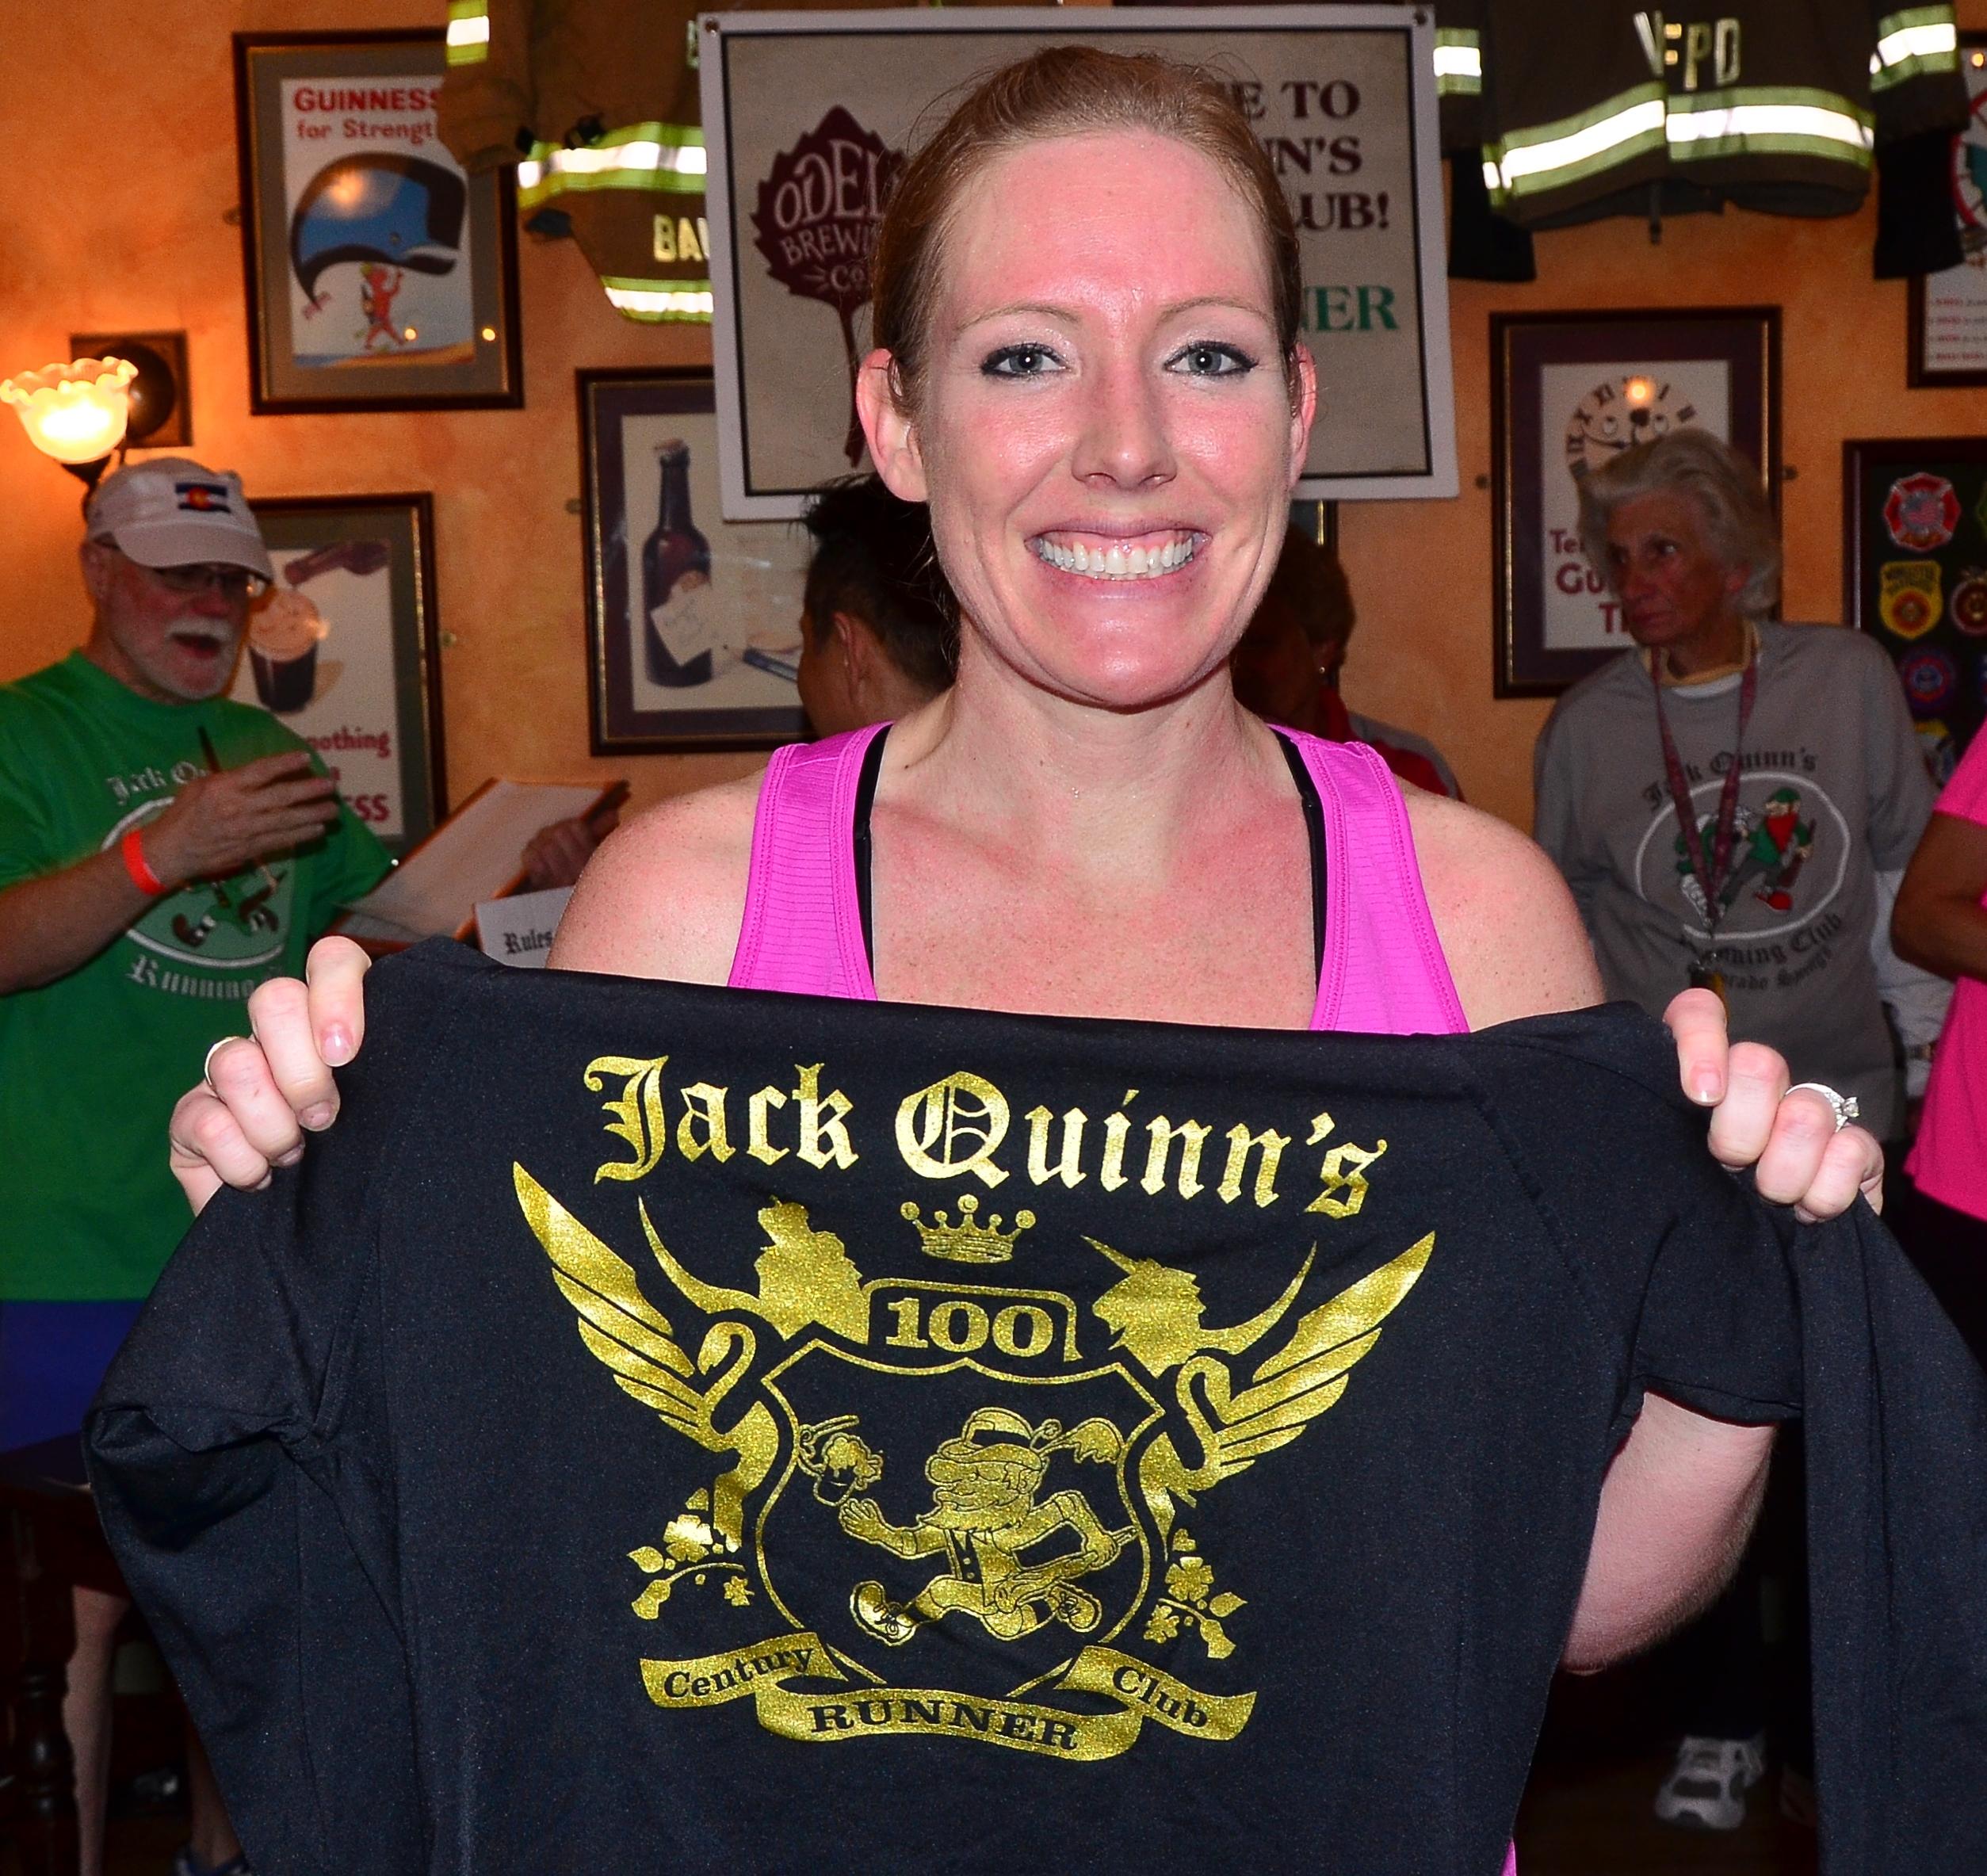 Jack Quinn's Run, April 21, Gallery 1